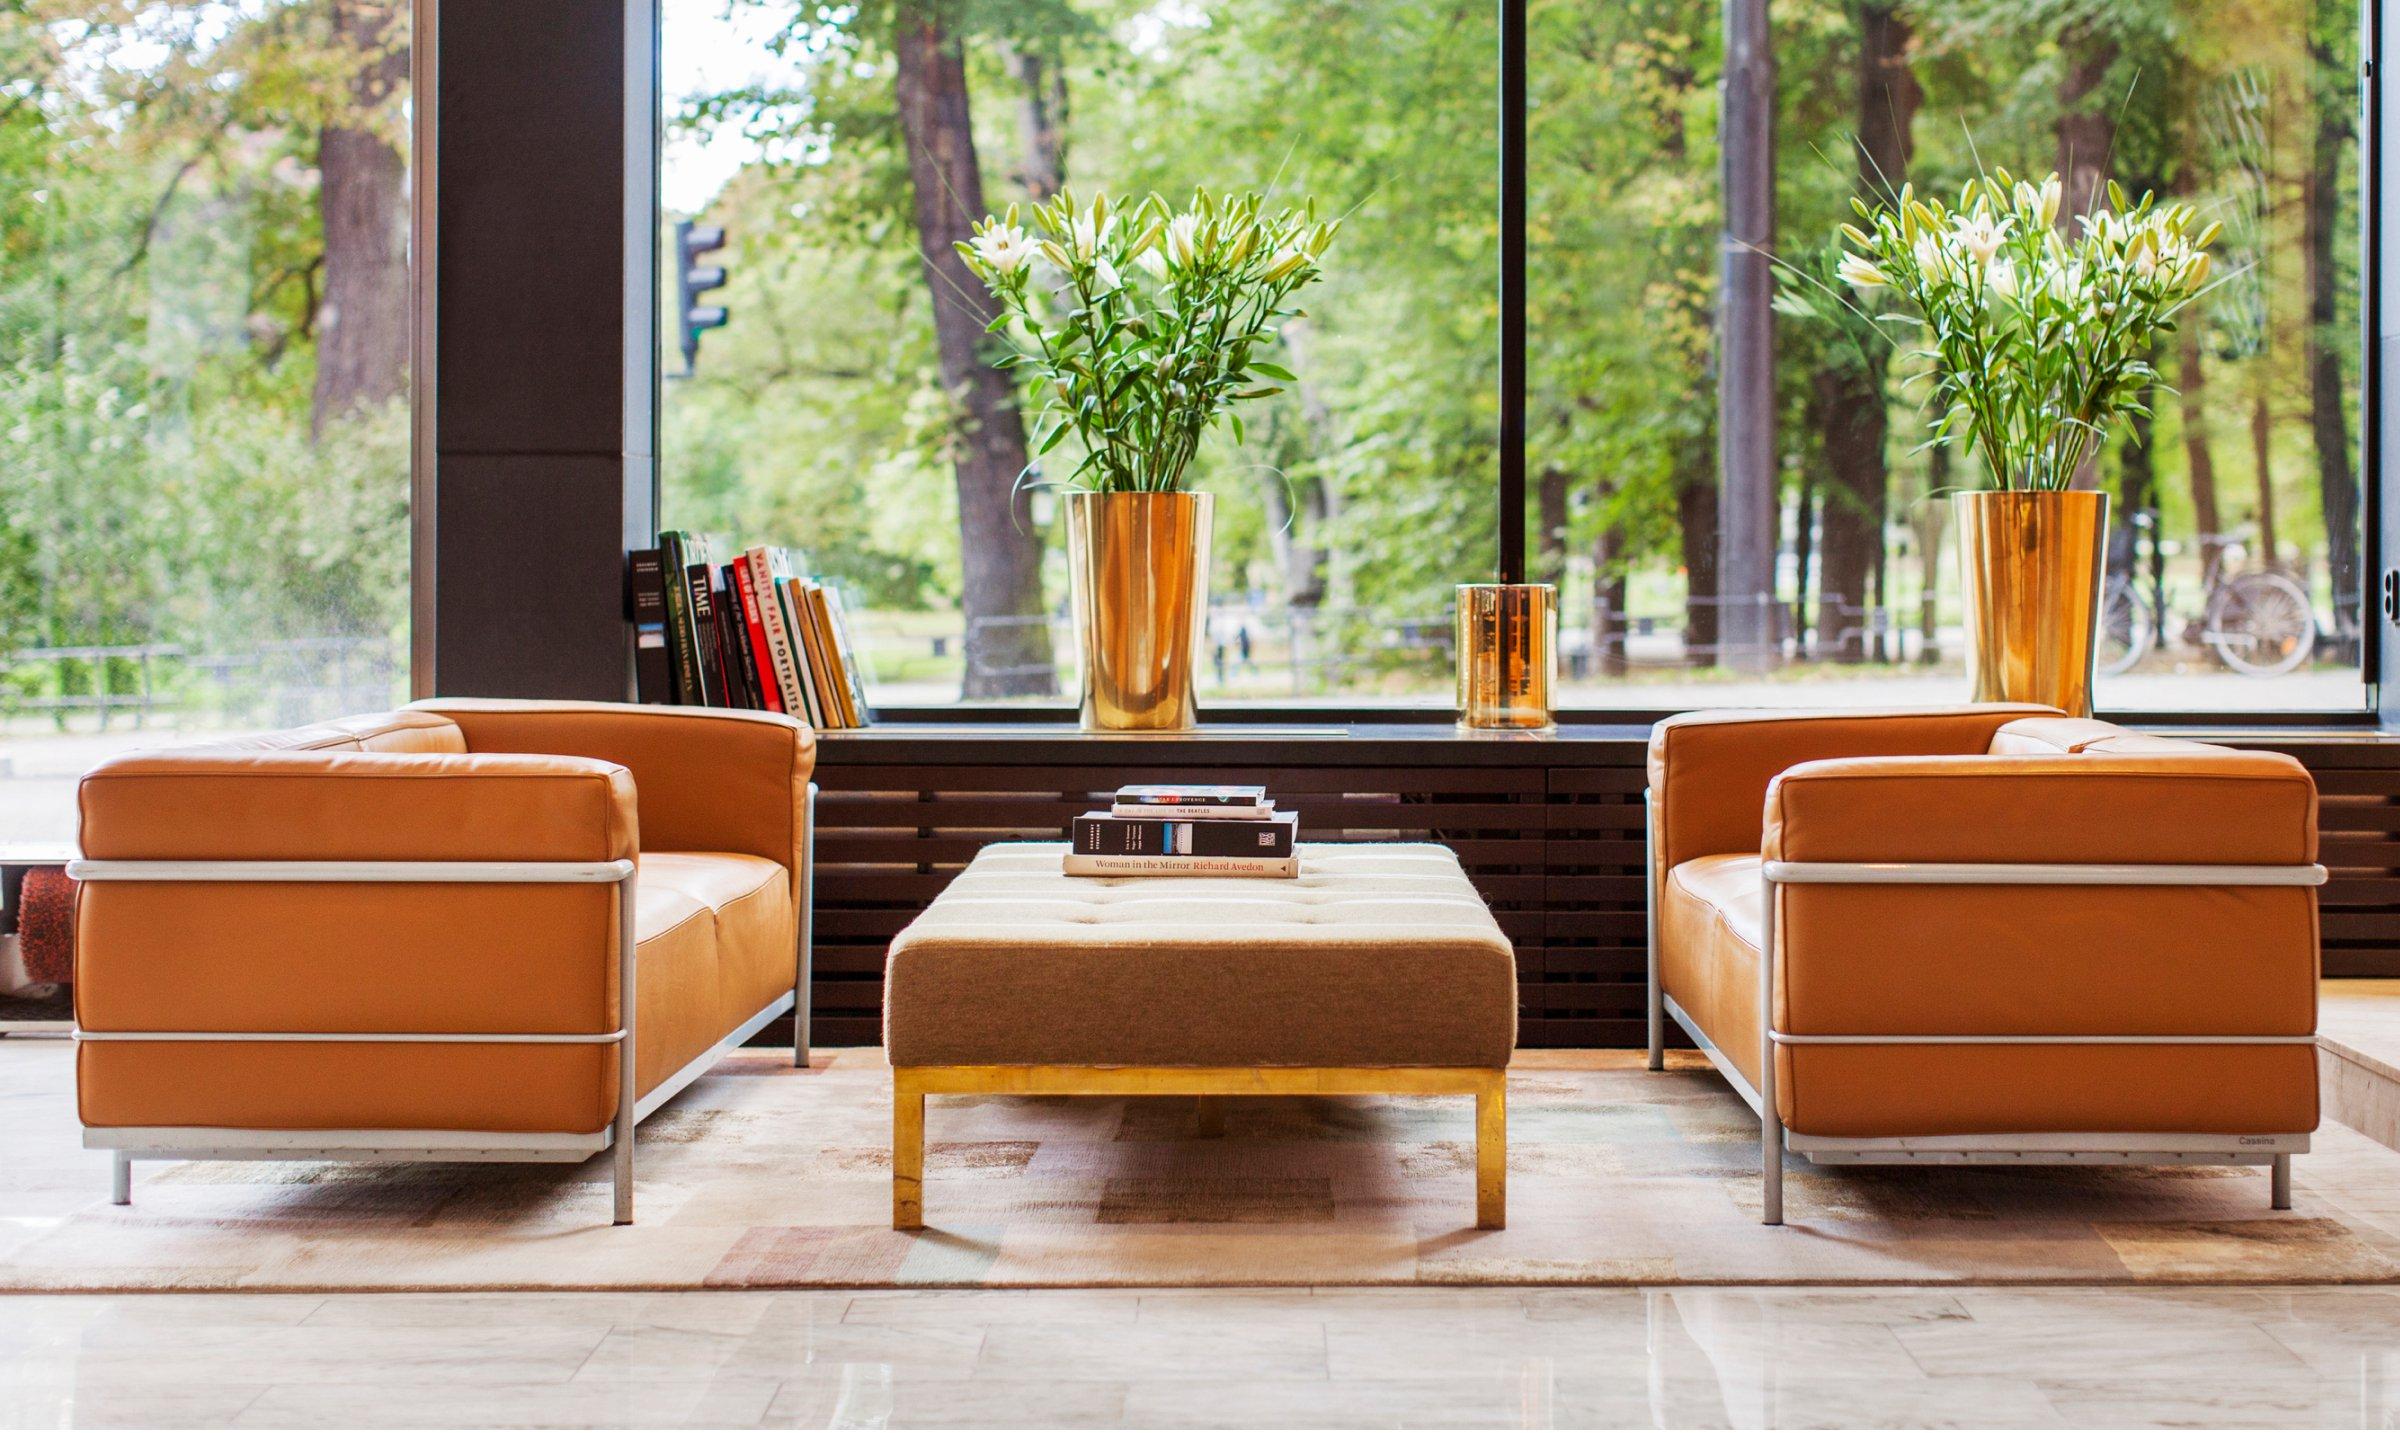 elite-hotel-case-sofas